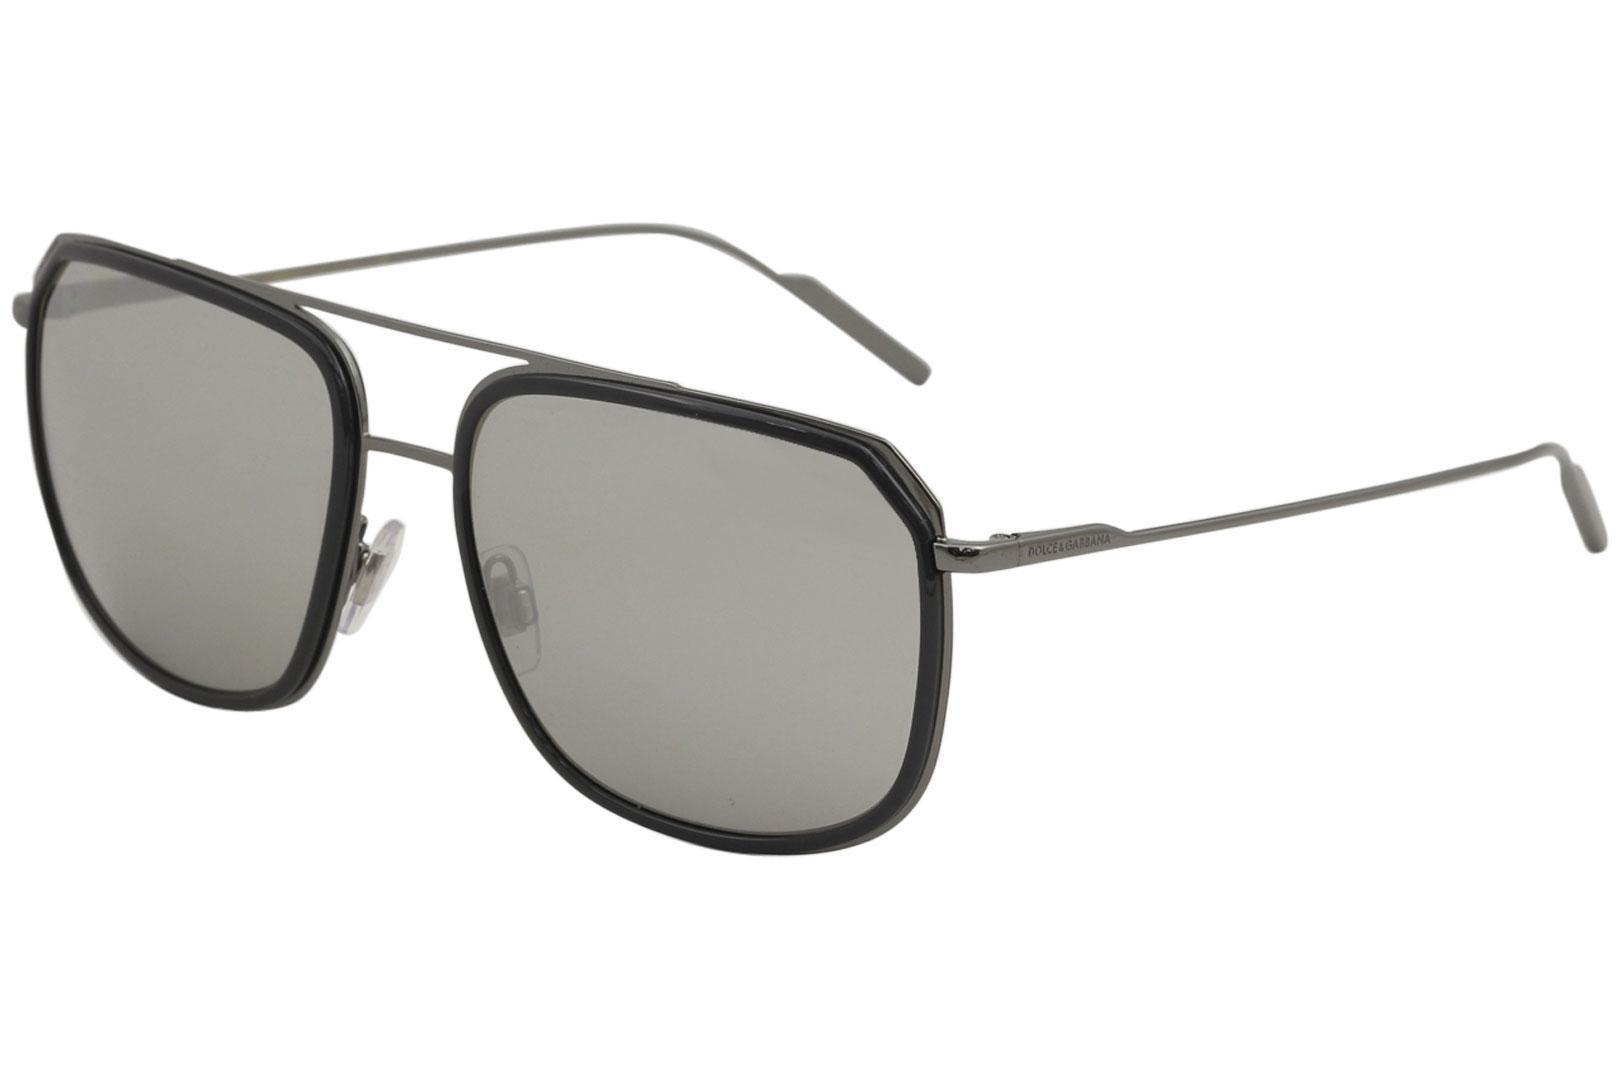 3233ff54c7 Dolce   Gabbana D G DG2165 DG 2165 04 6G Grey Gunmetal Pilot ...